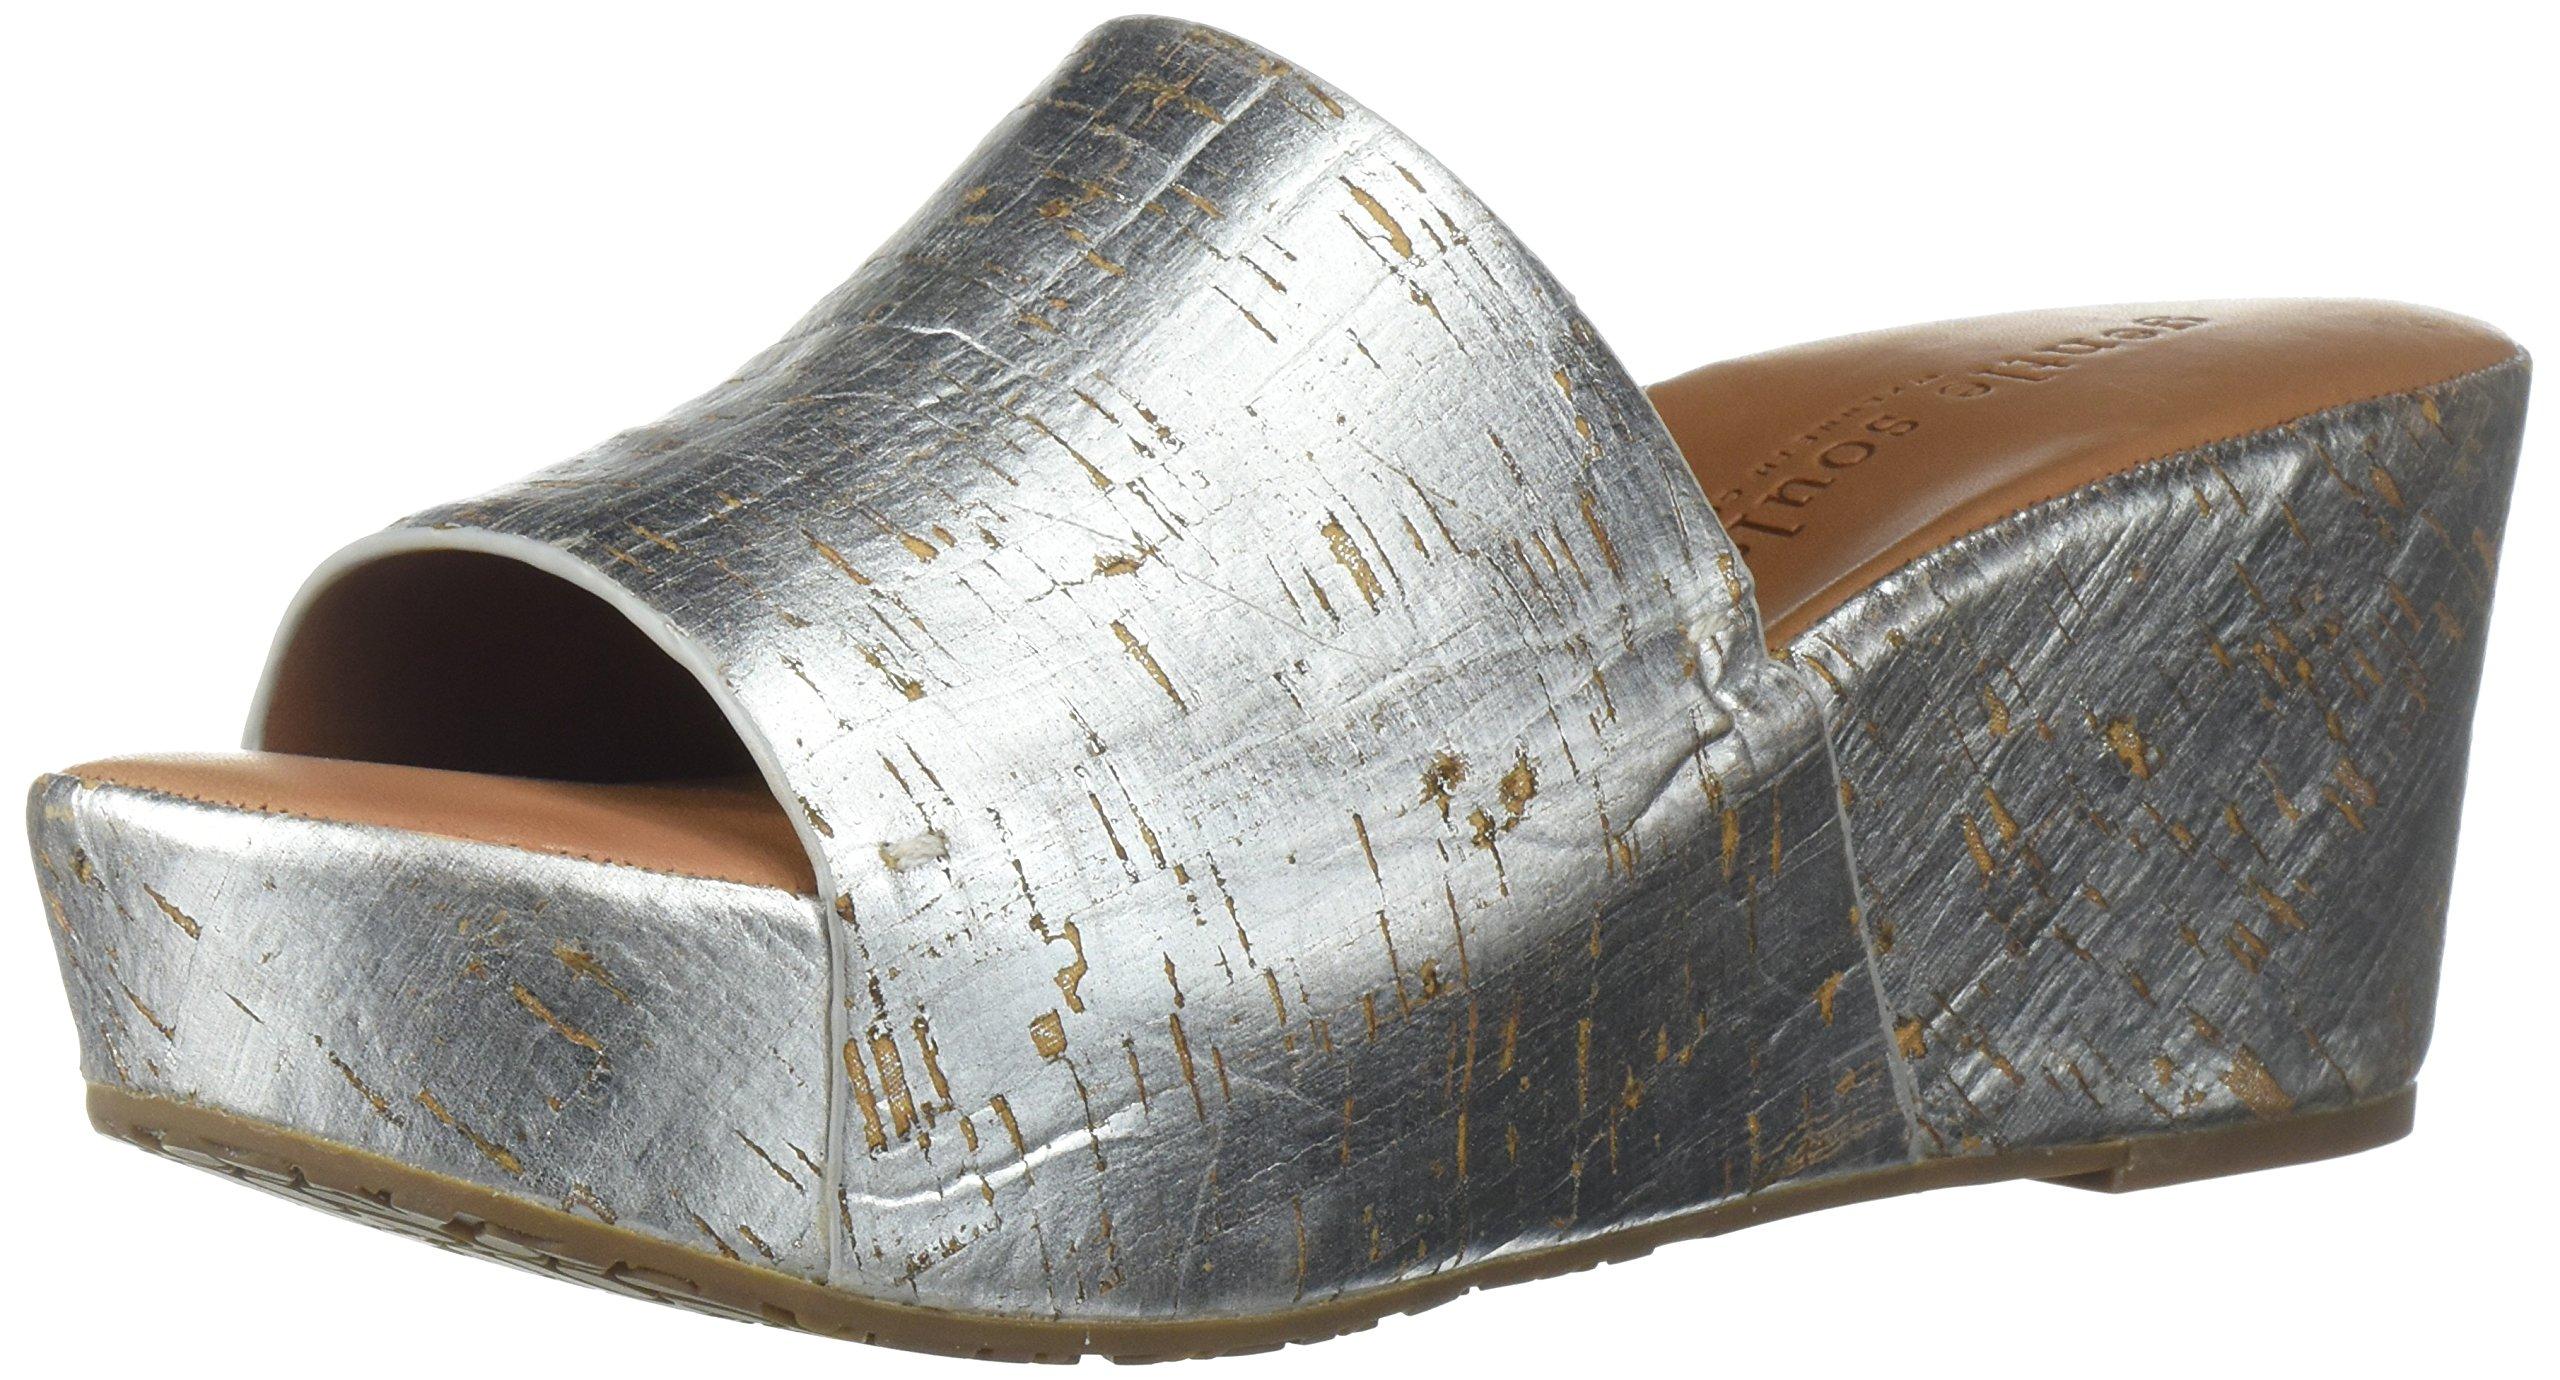 Gentle Souls Women's Forella Platform Slip Slide Sandal, Silver, 6.5 M US